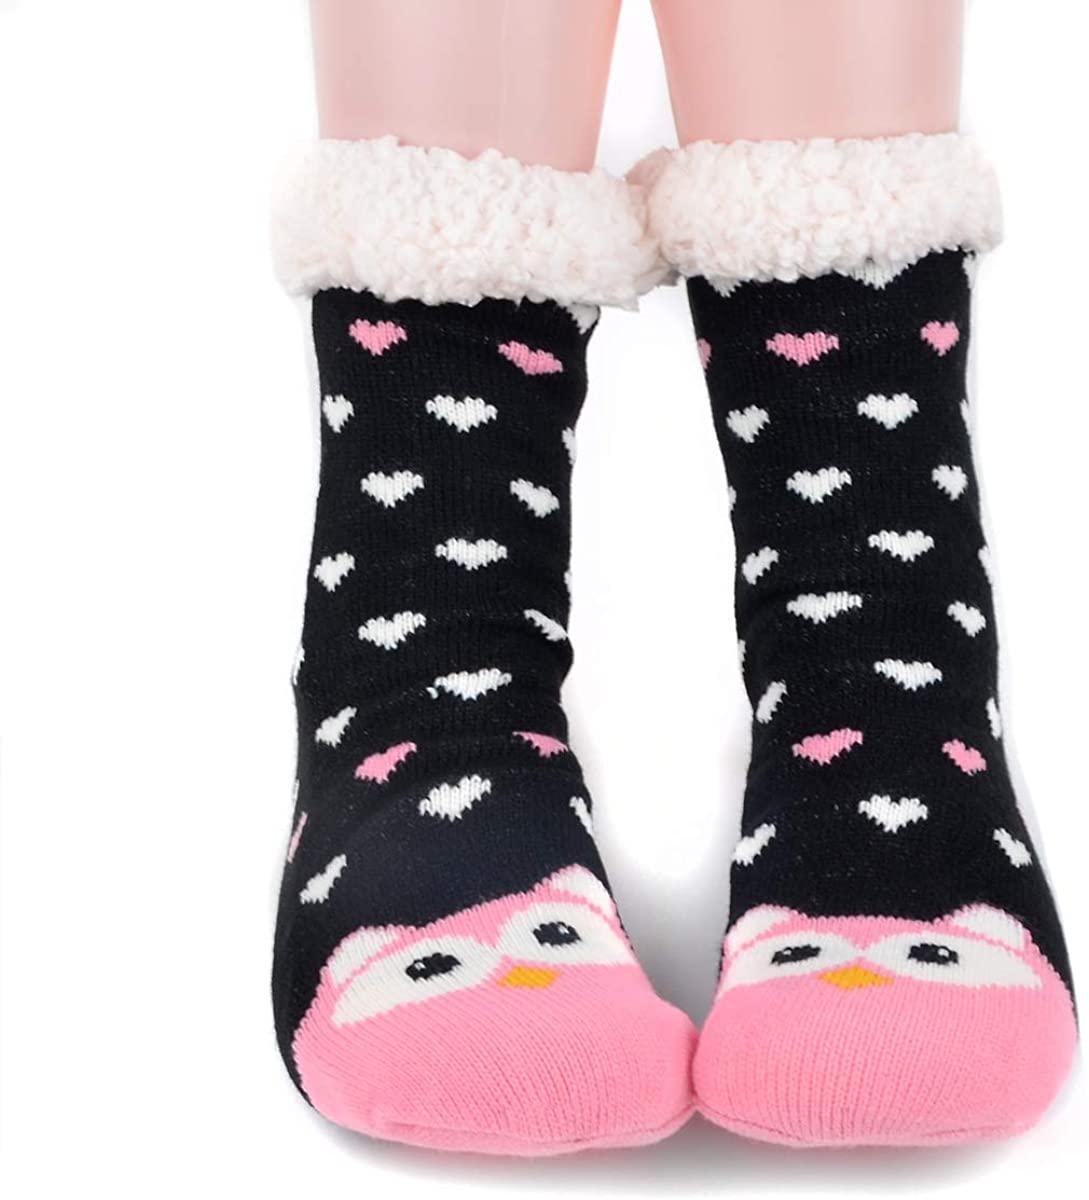 Women's Fleece Slipper Socks Cozy & Warm Sherpa Socks Non Slip with Grippers House Slippers Winter Holidays Christmas Gifts